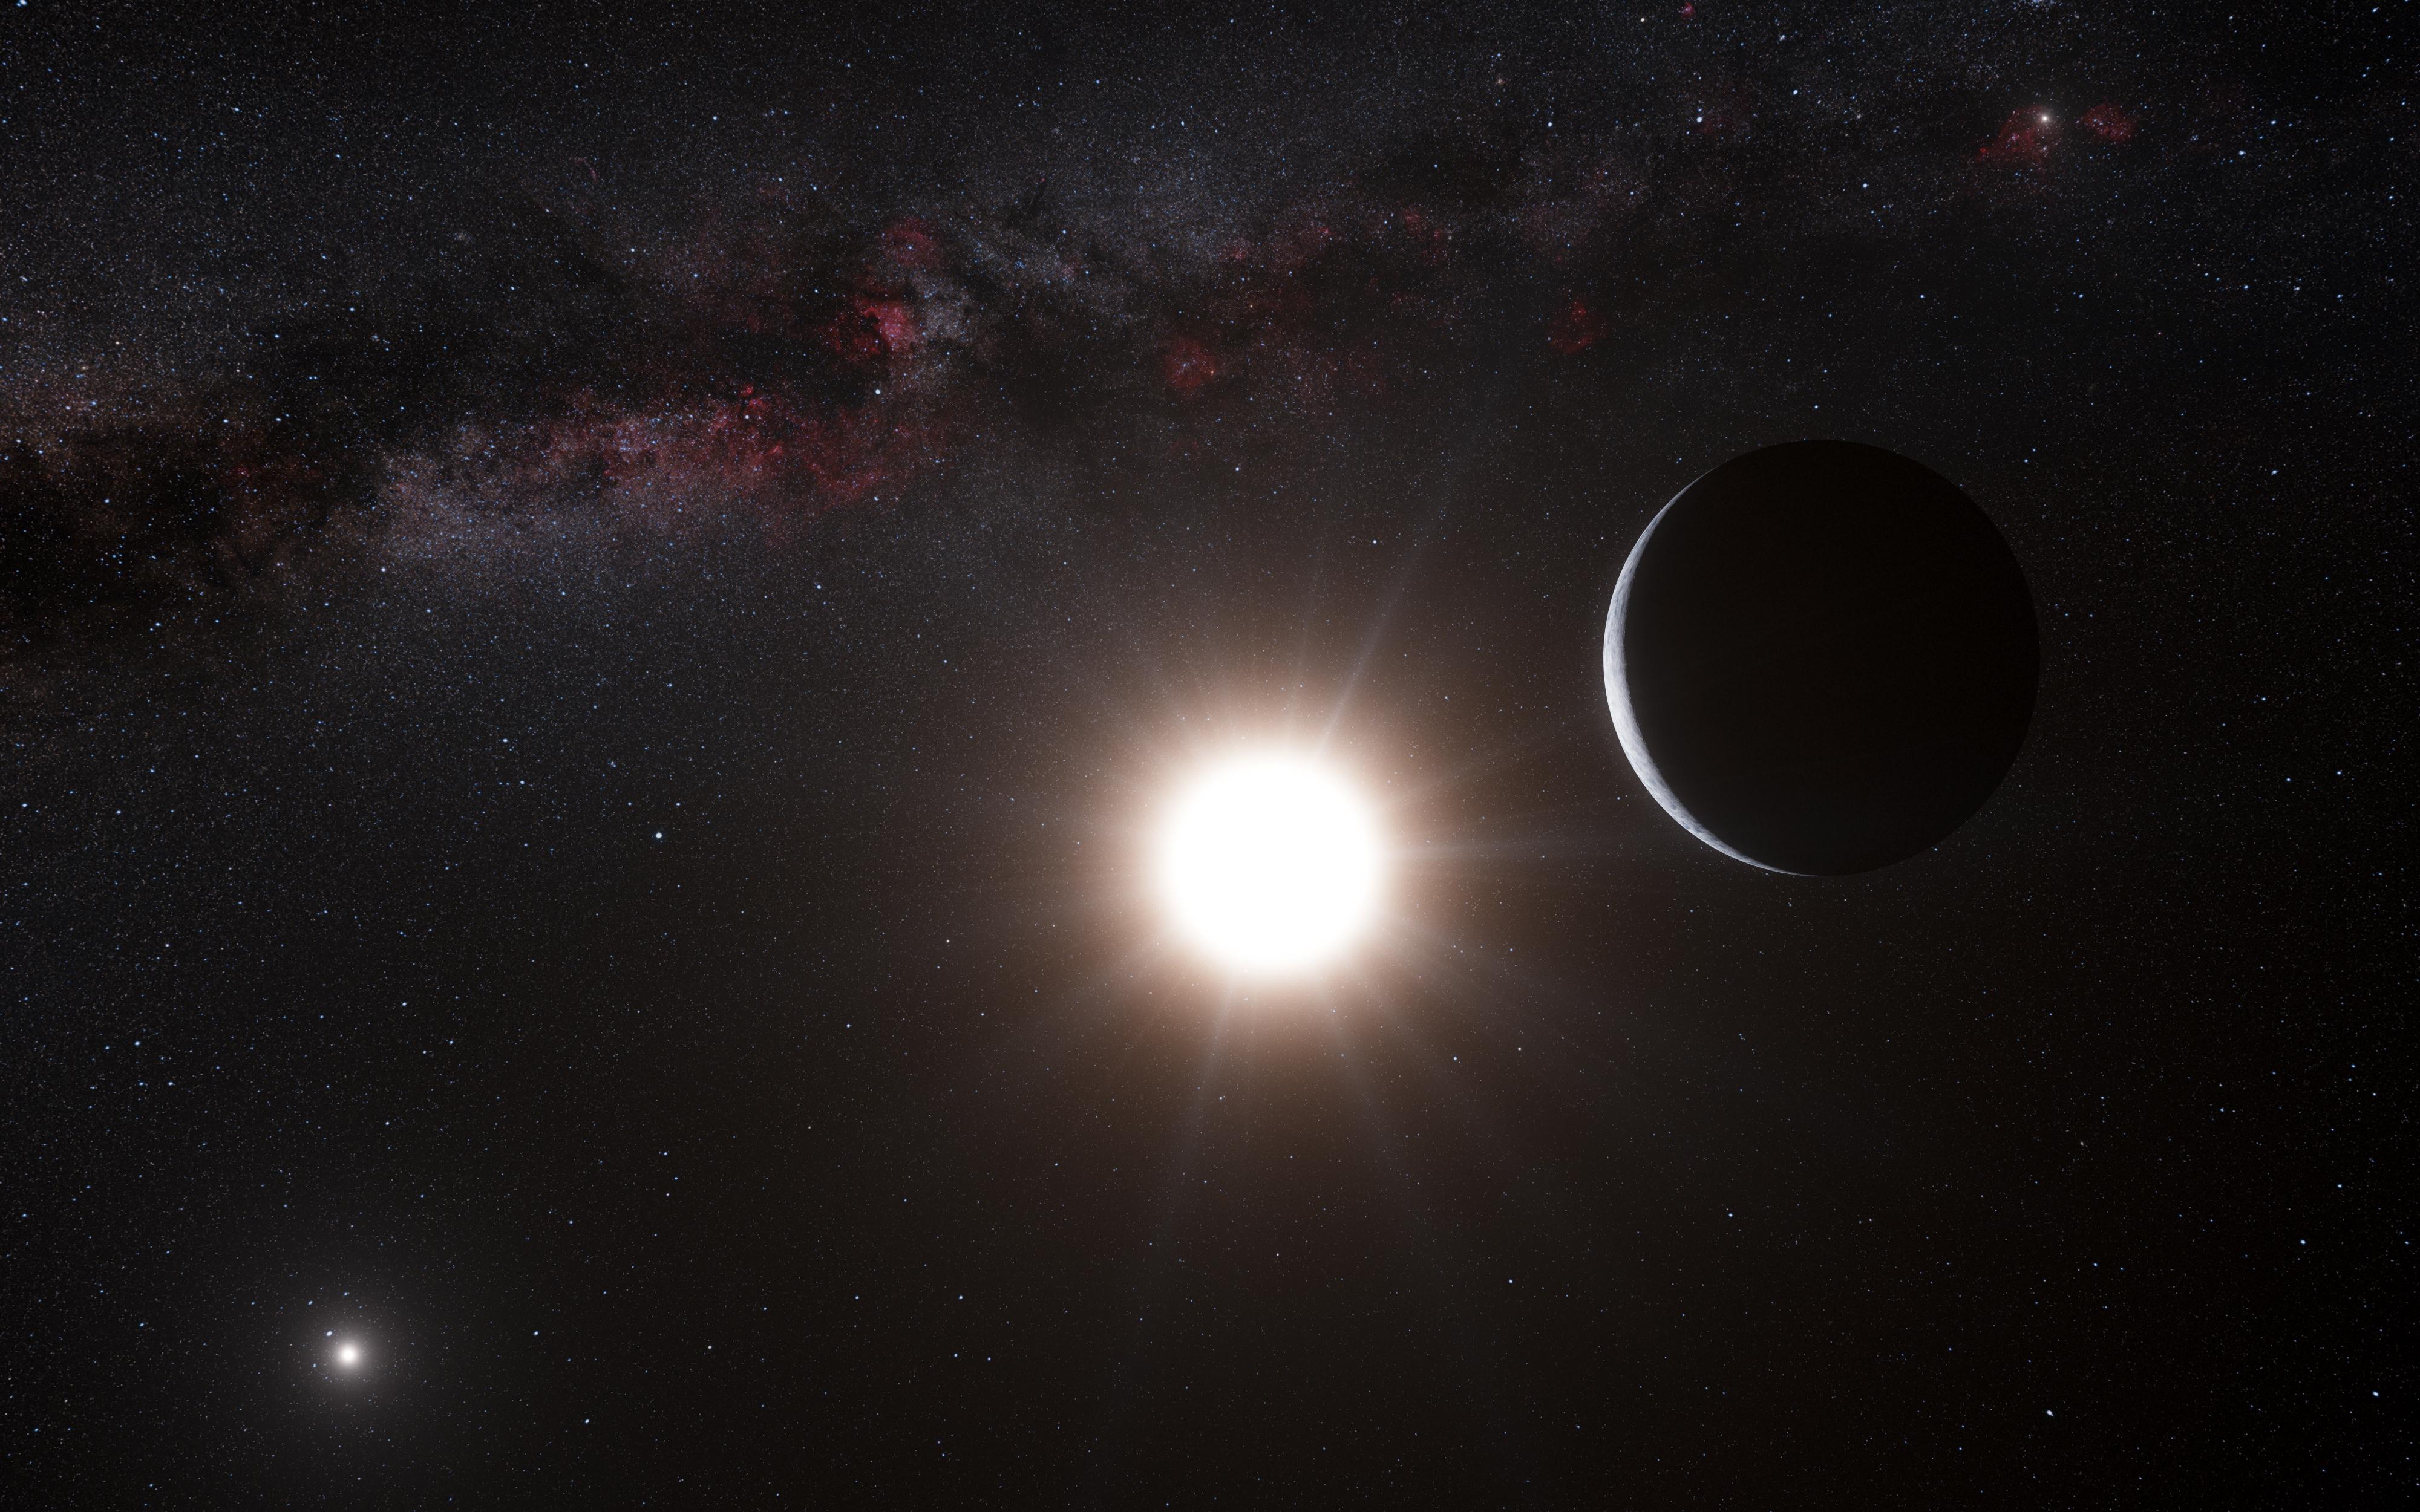 Картинки планеты проксима центавра